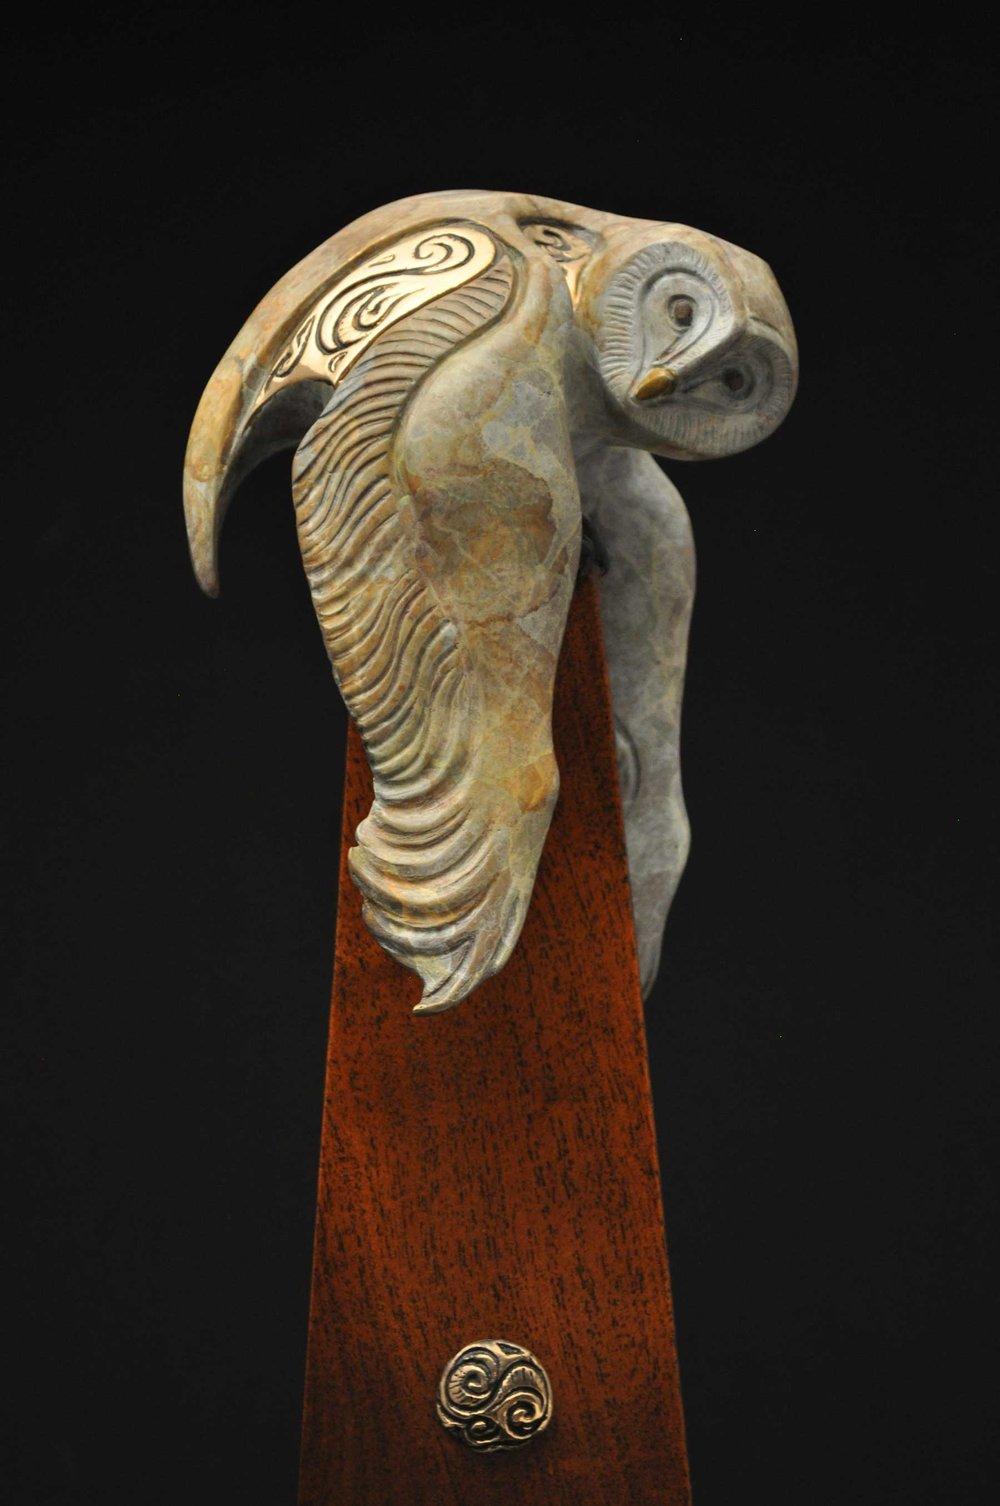 bronze-owl-sculpture-john-maisano---83.jpg